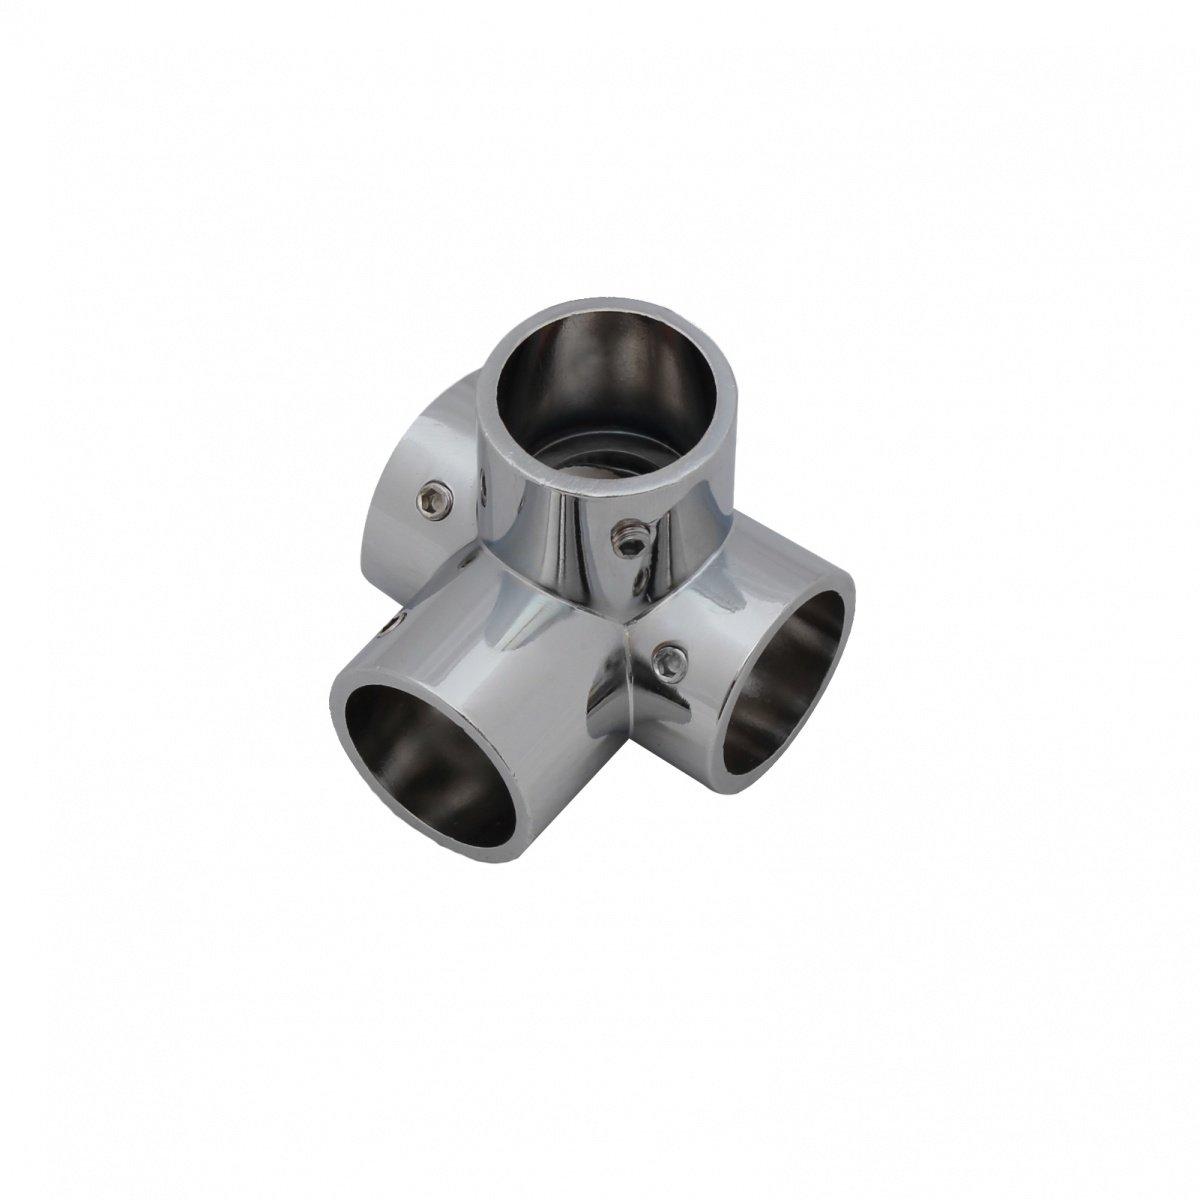 25mm Chrom Rohrverbinder Relingverbinder Reling Beschlag Stangen Verbindung 2-01 Rohrbogen